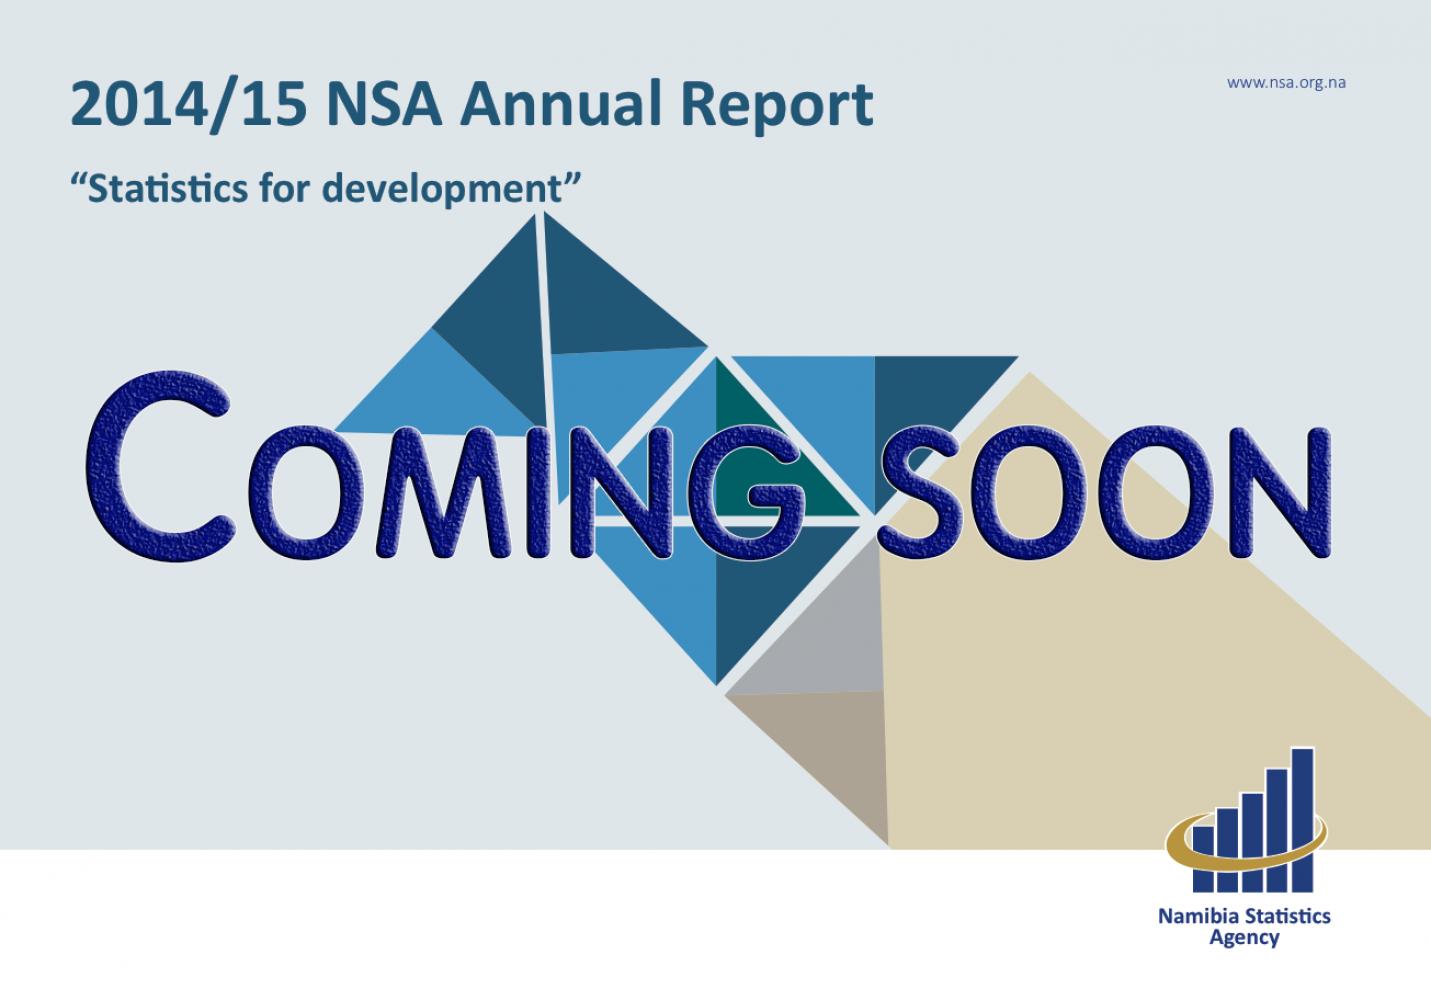 Annual Reprot 2014/15